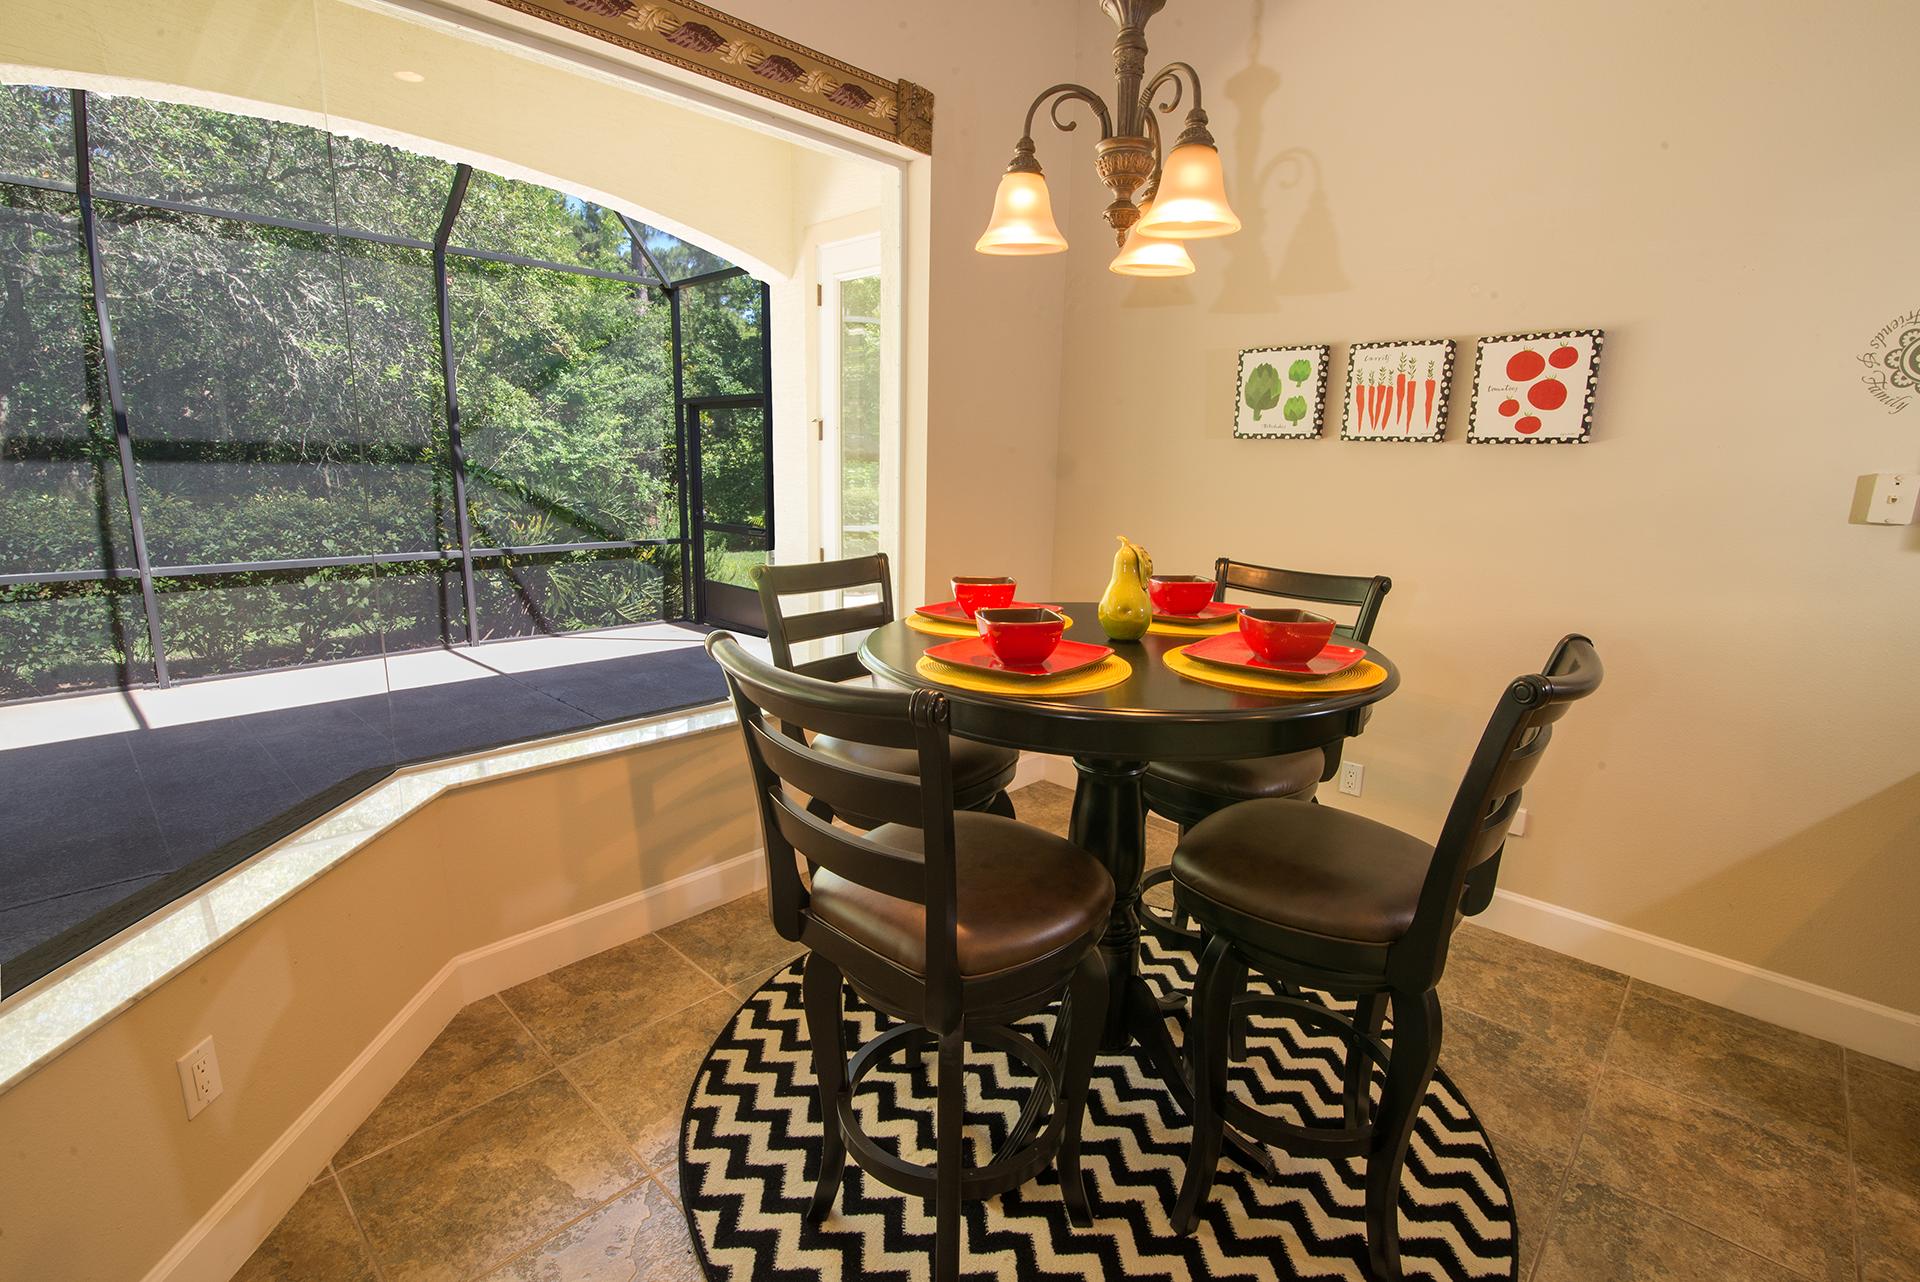 Staged-Assets-Home-Staging-Interior-Design-Palm-Coast-Florida-16